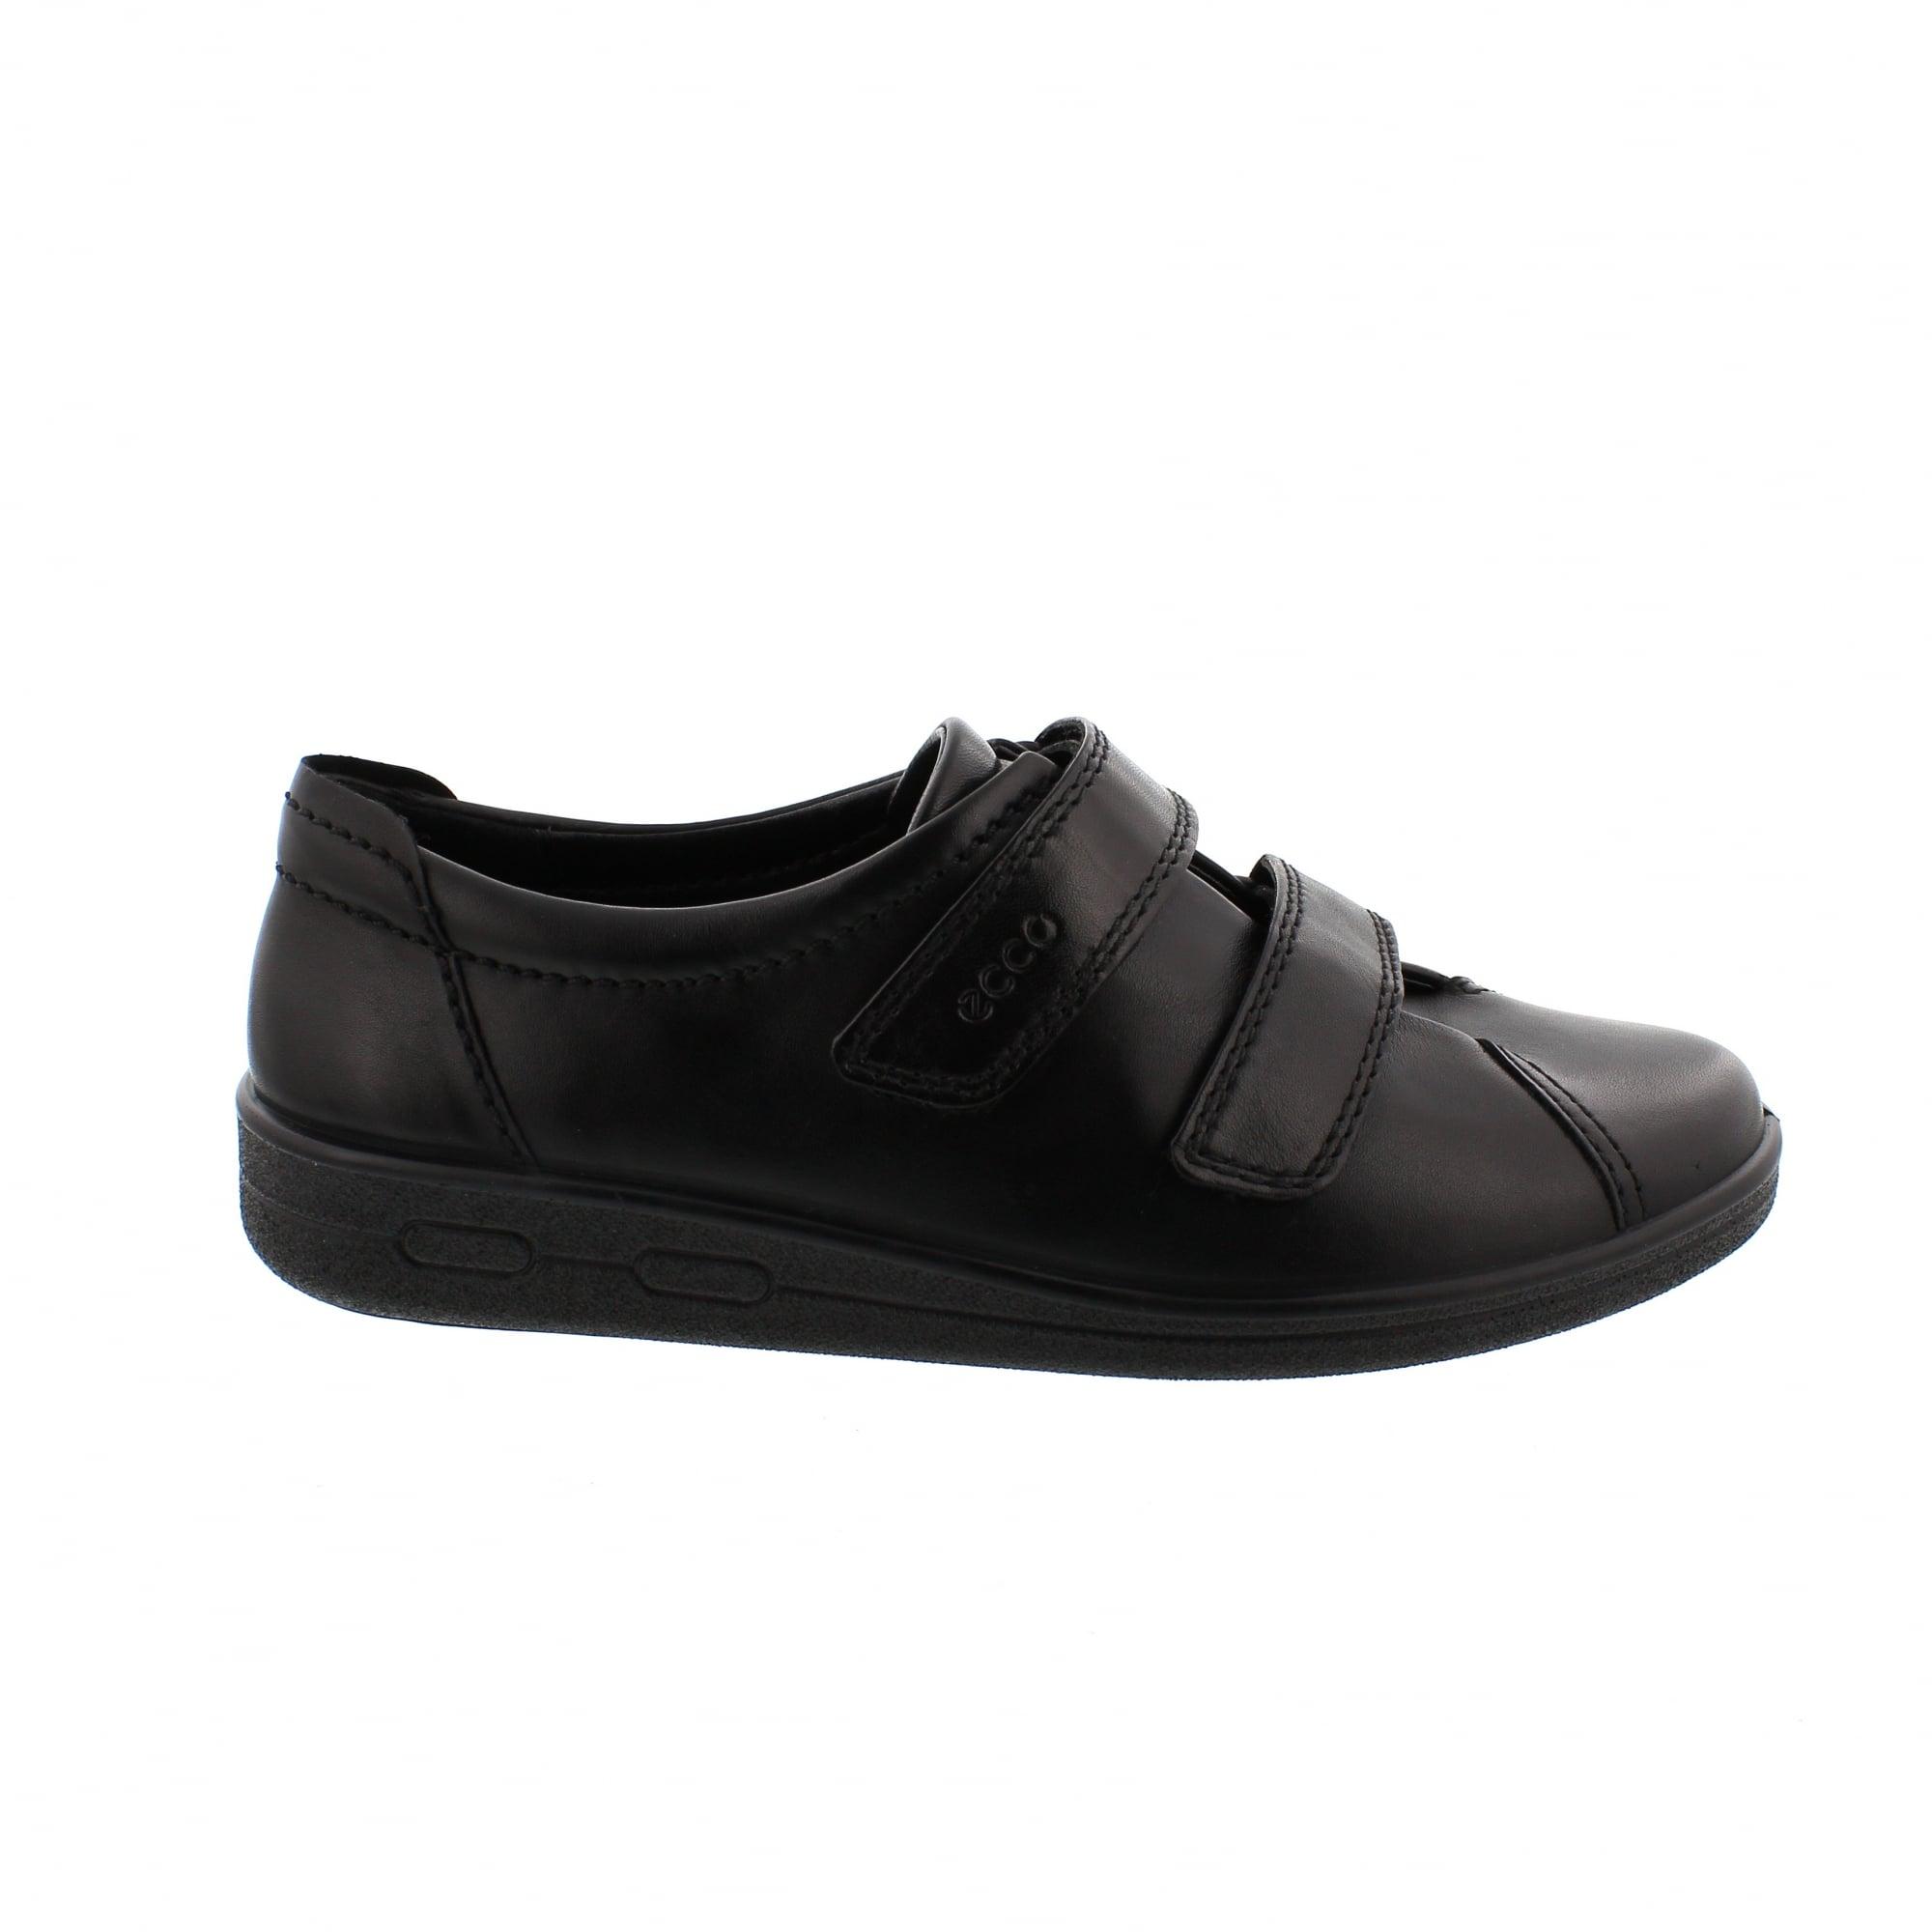 Ecco Soft II 012573-00101 Womens Shoes